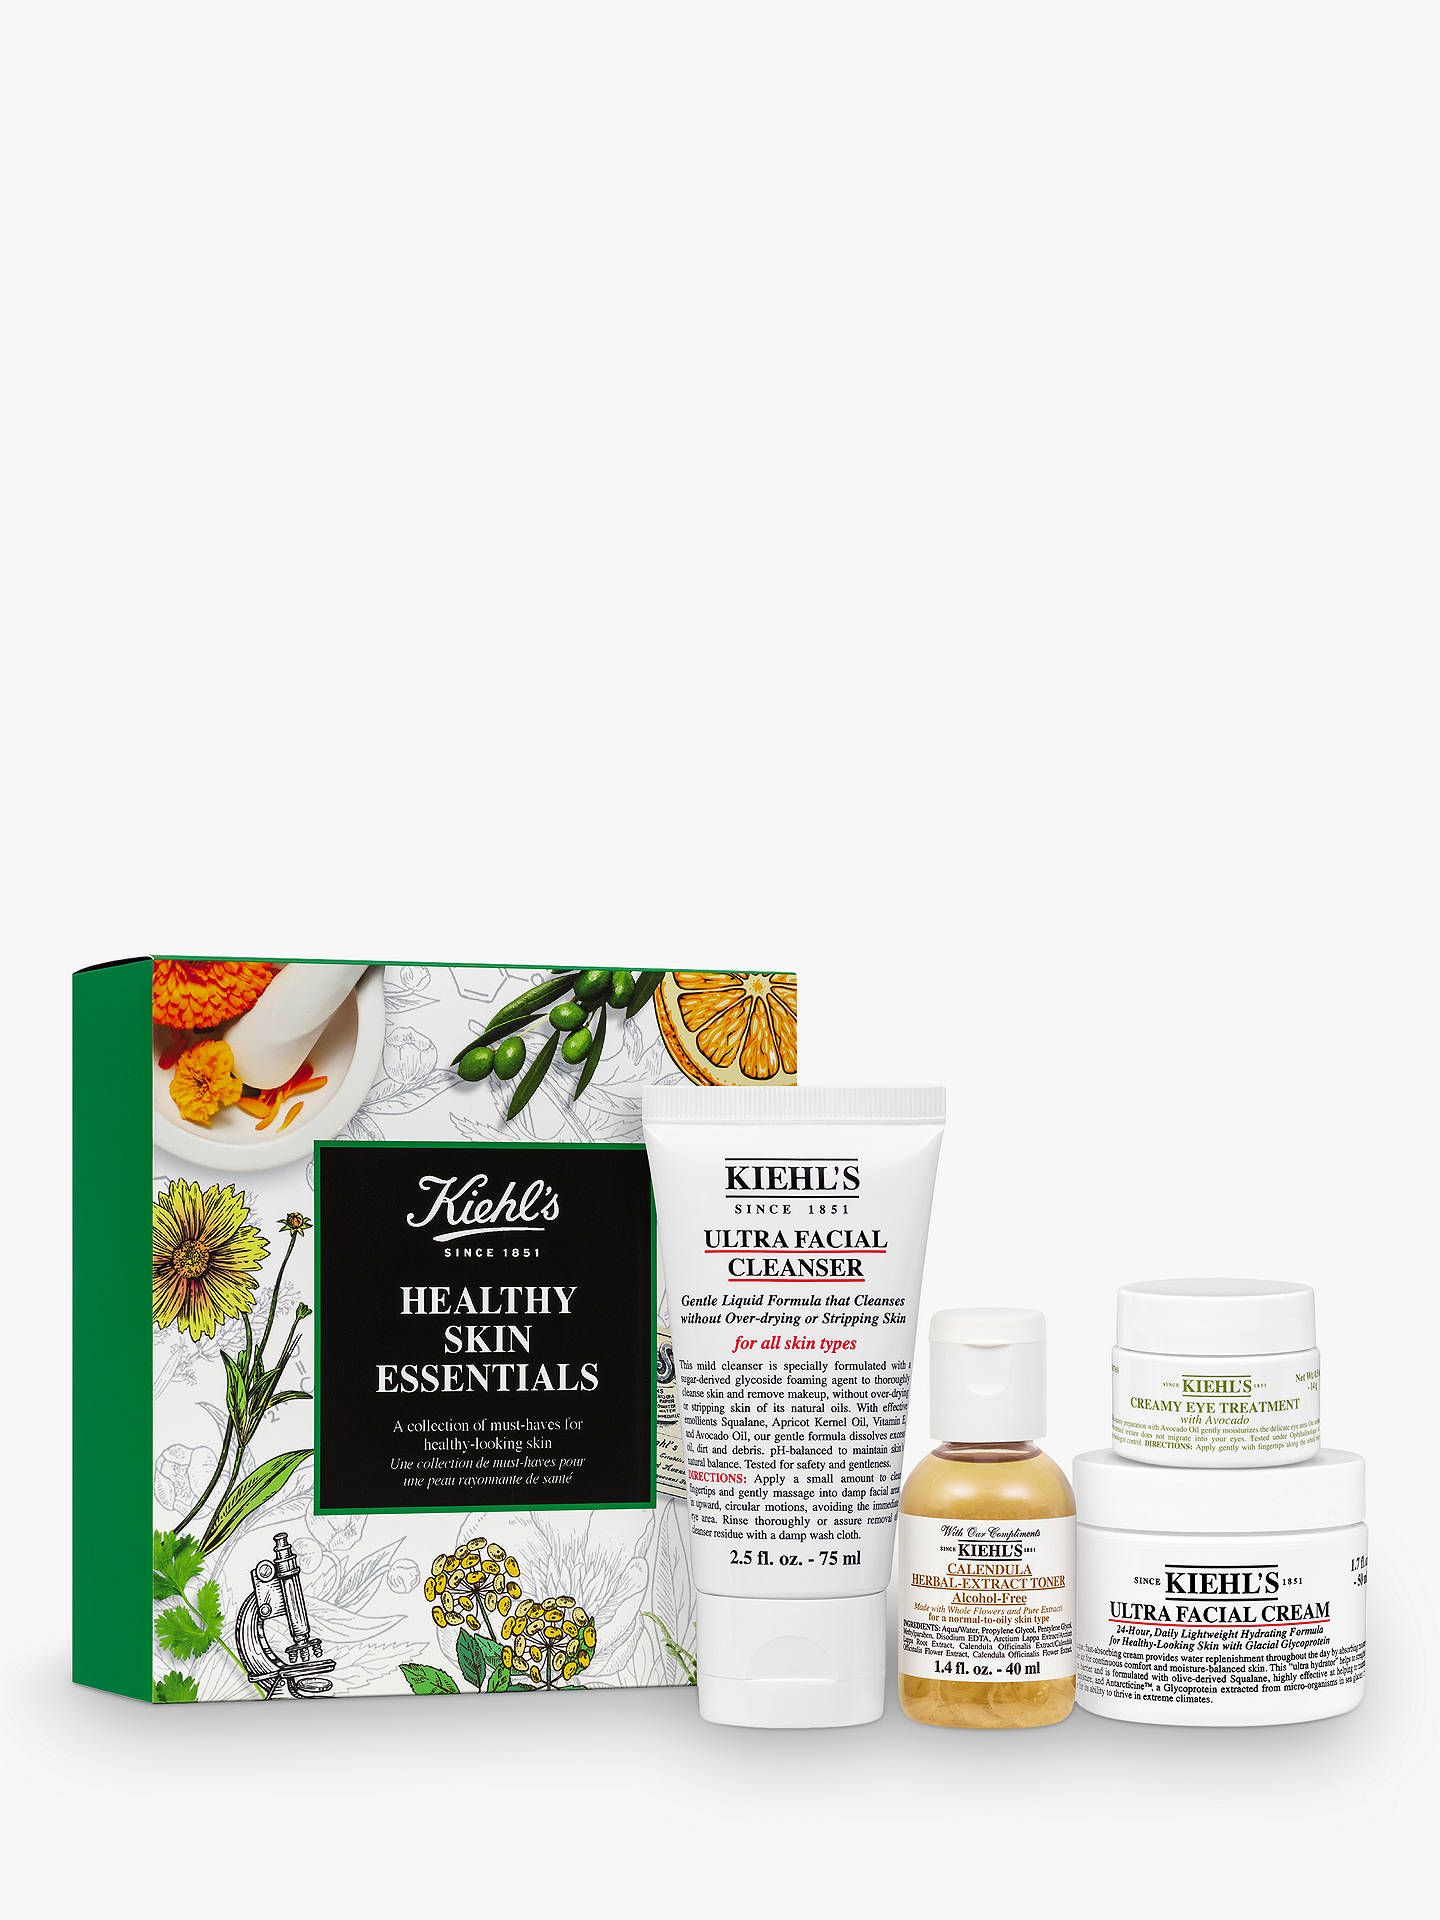 Kiehls healthy skin essentials skincare gift set skin